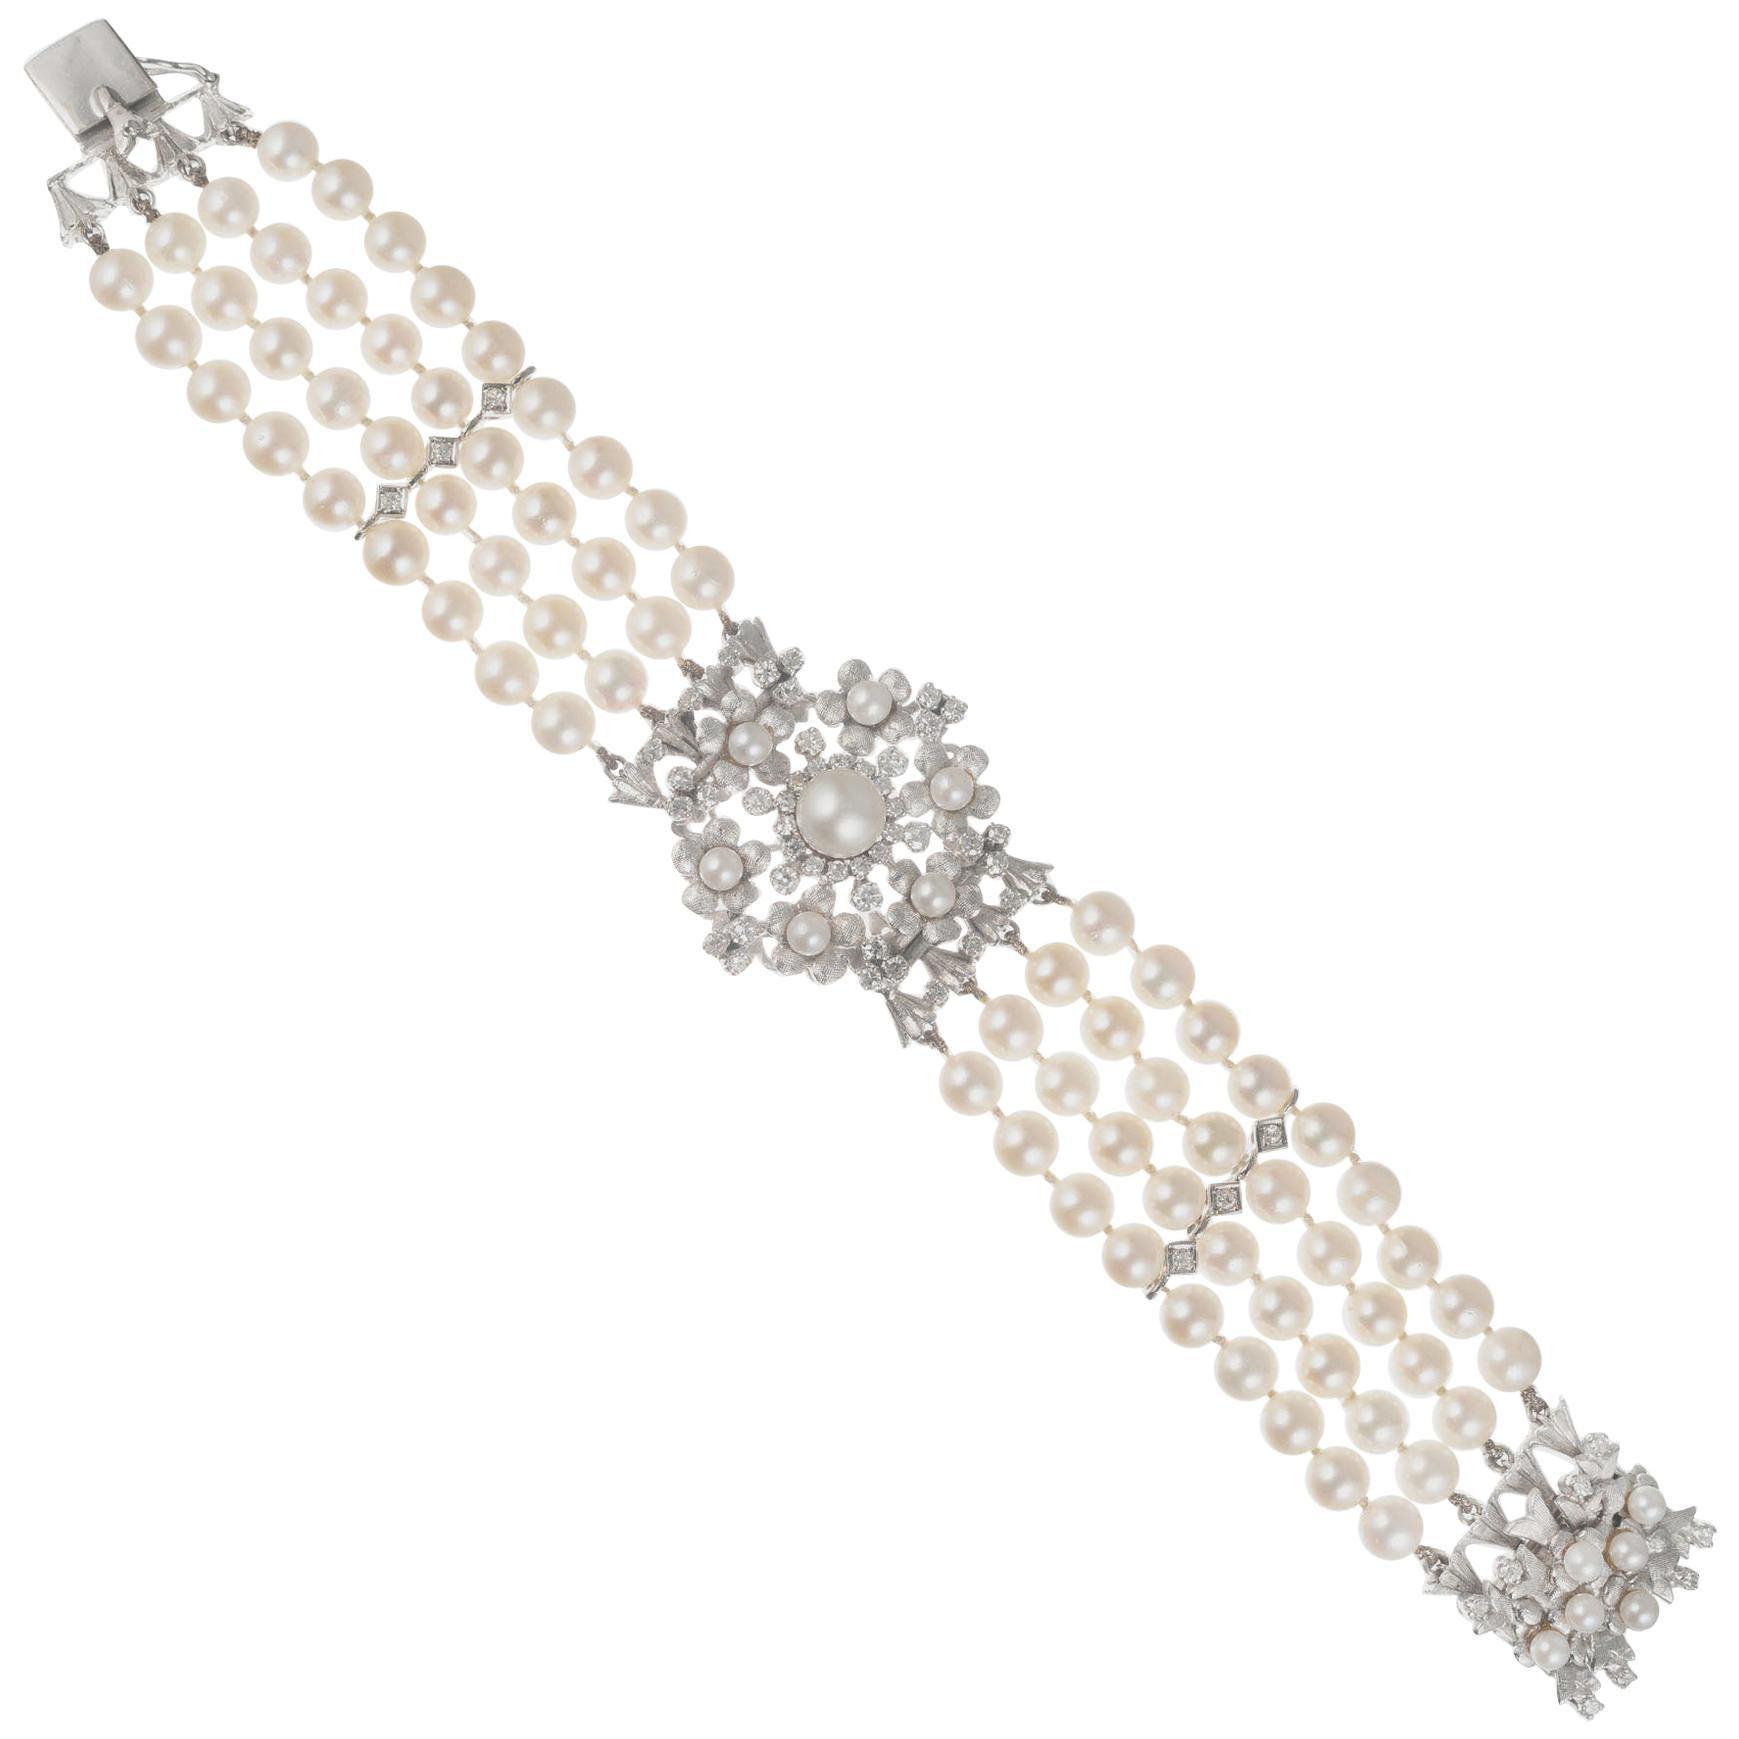 1.20 Carat Diamond Cultured Pearl White Gold Four Row Bracelet